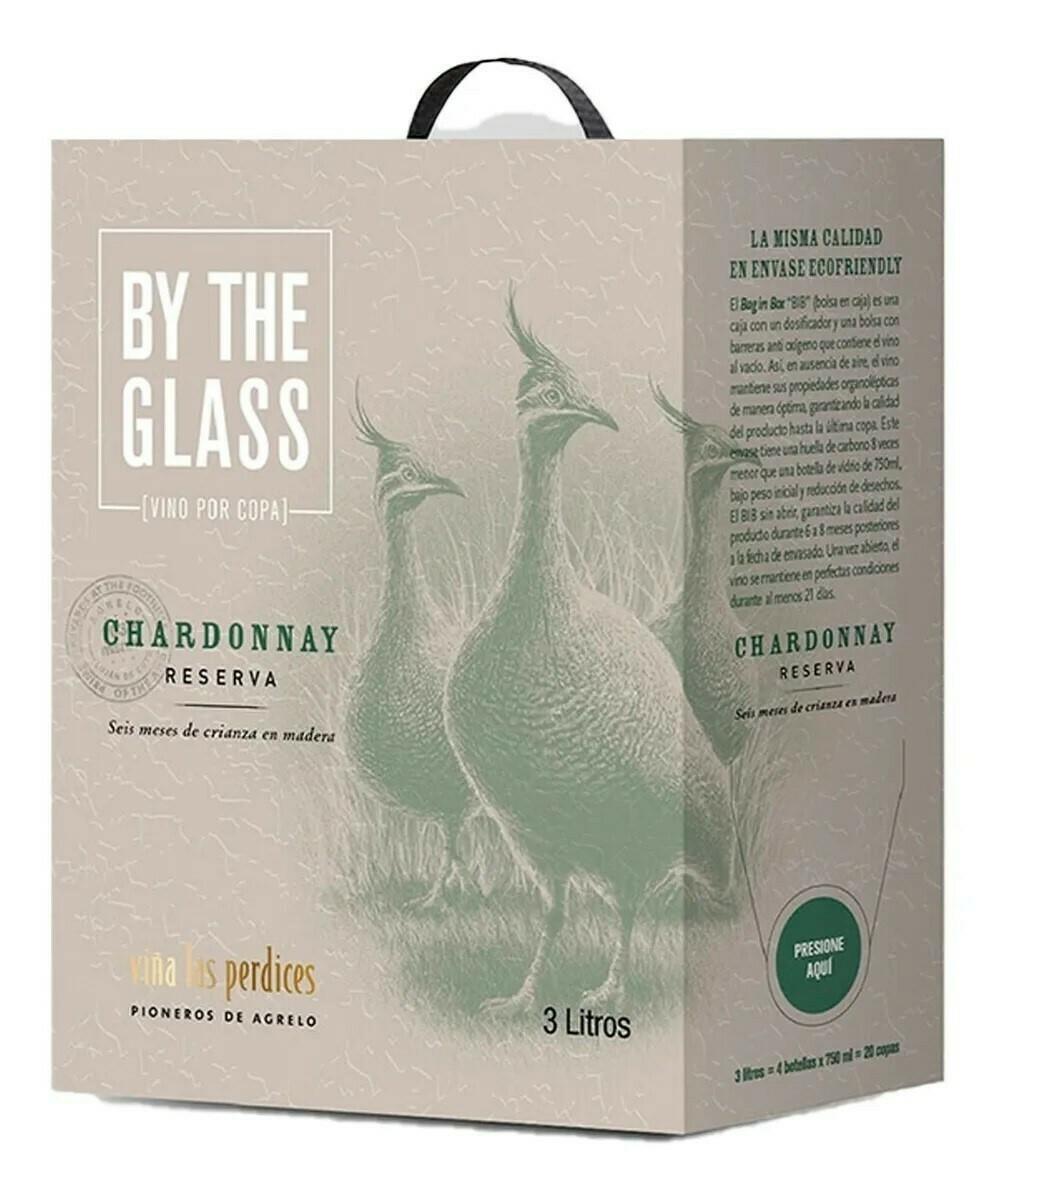 Vino Blanco Las perdices Bag in Box Chardonnay x3000cc